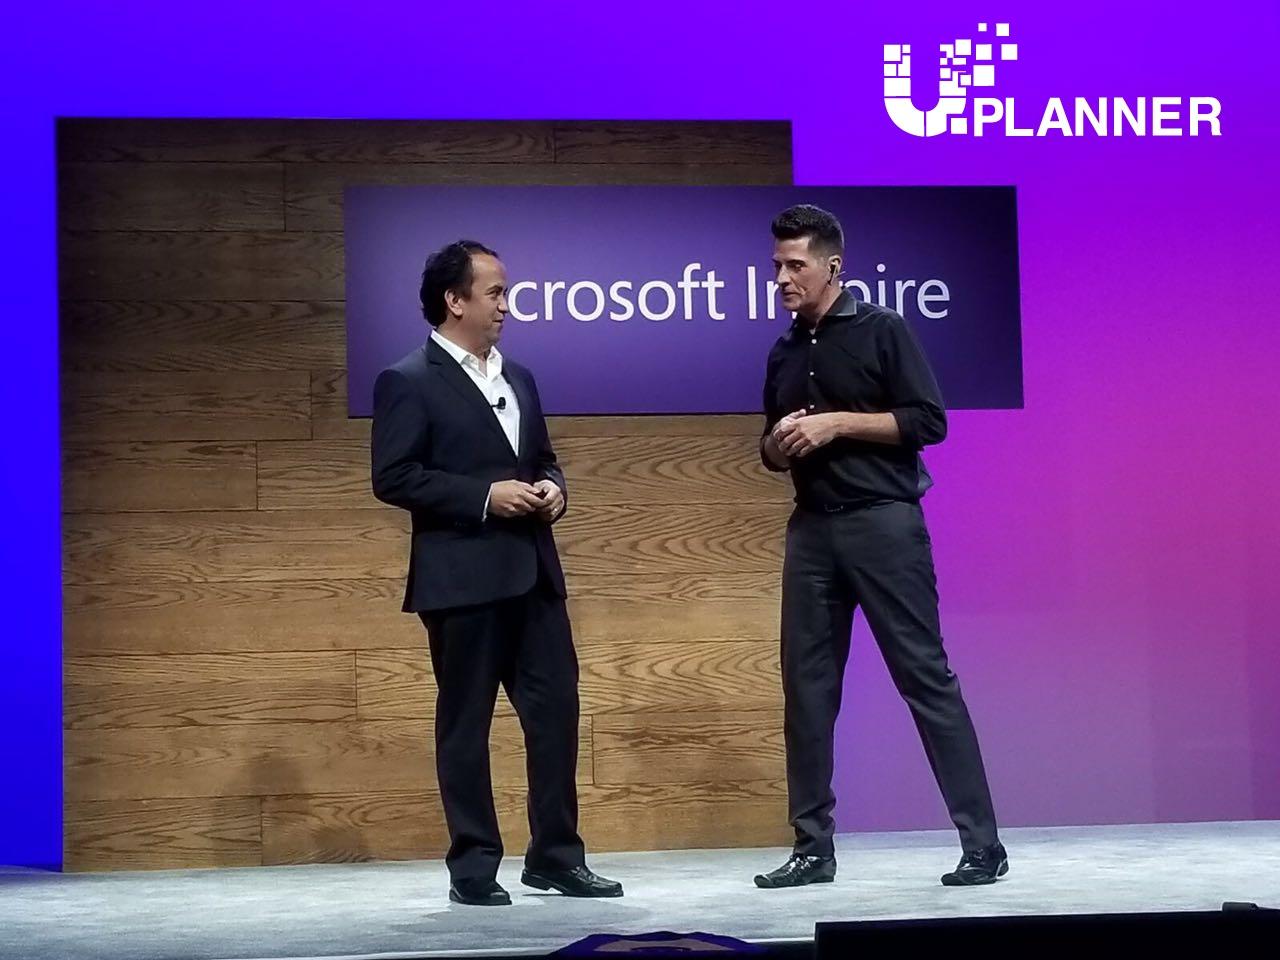 Foto U-Planner Microsoft